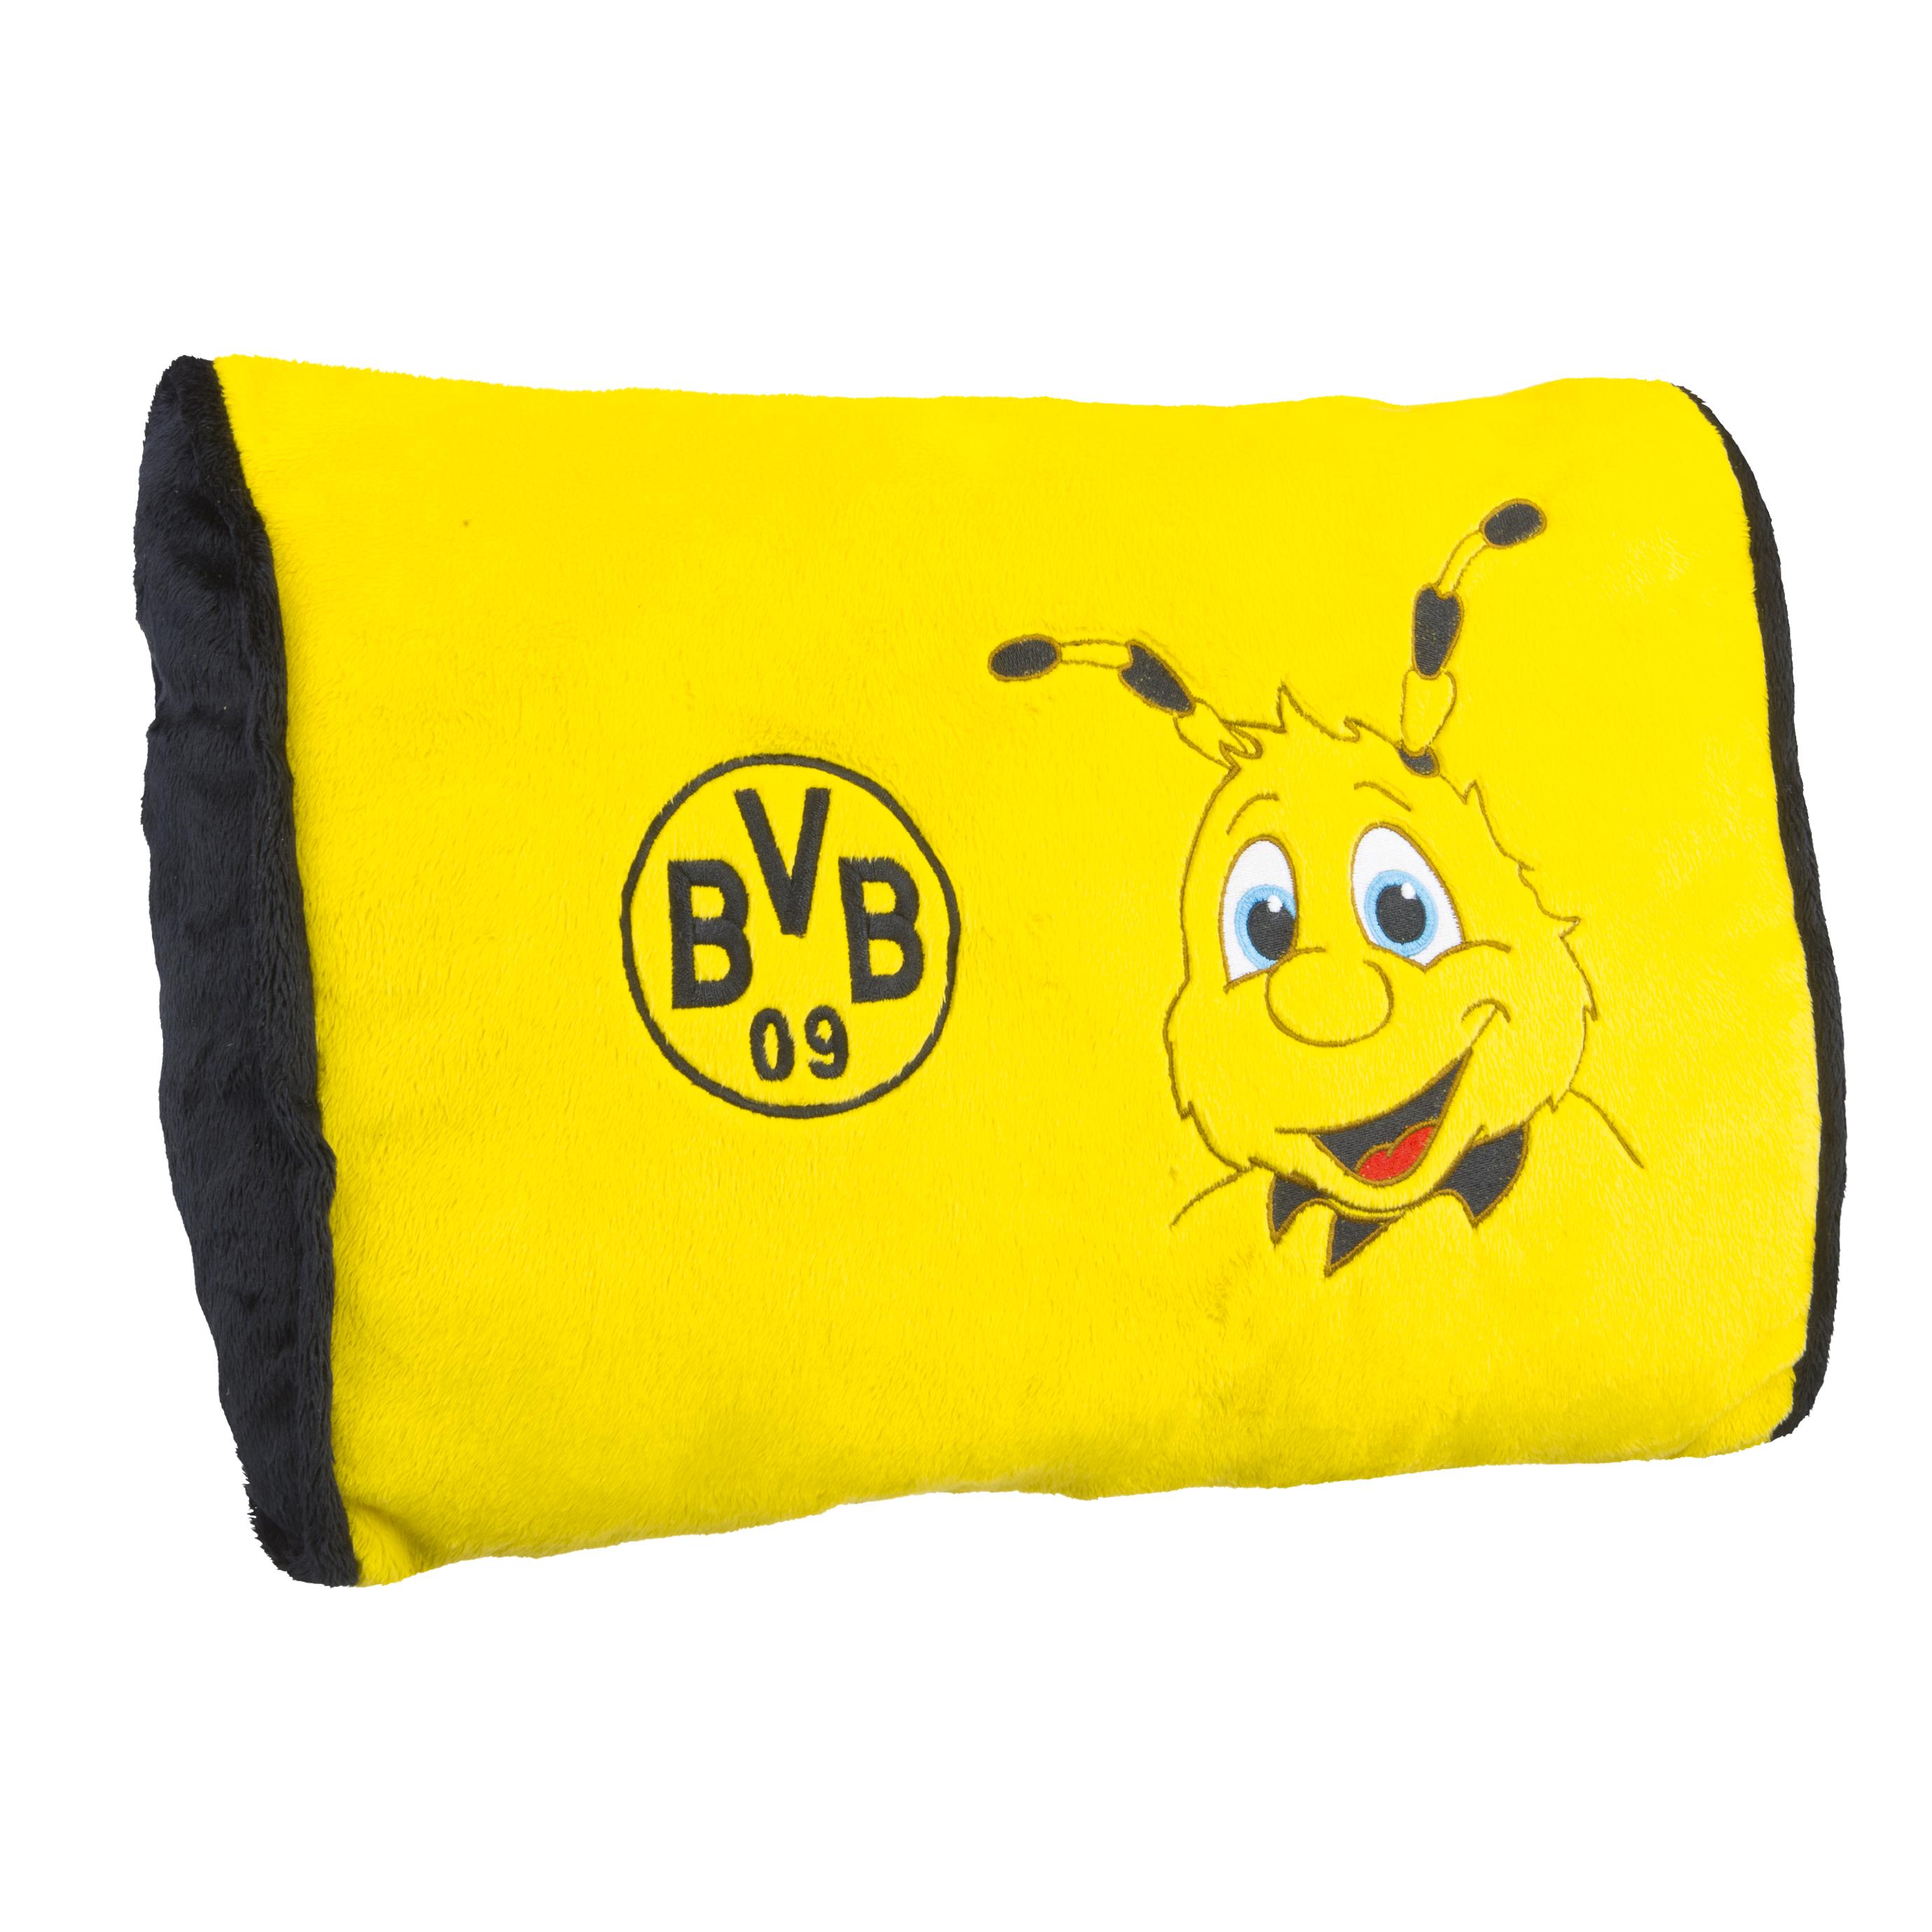 BVB EMMA plush pillow